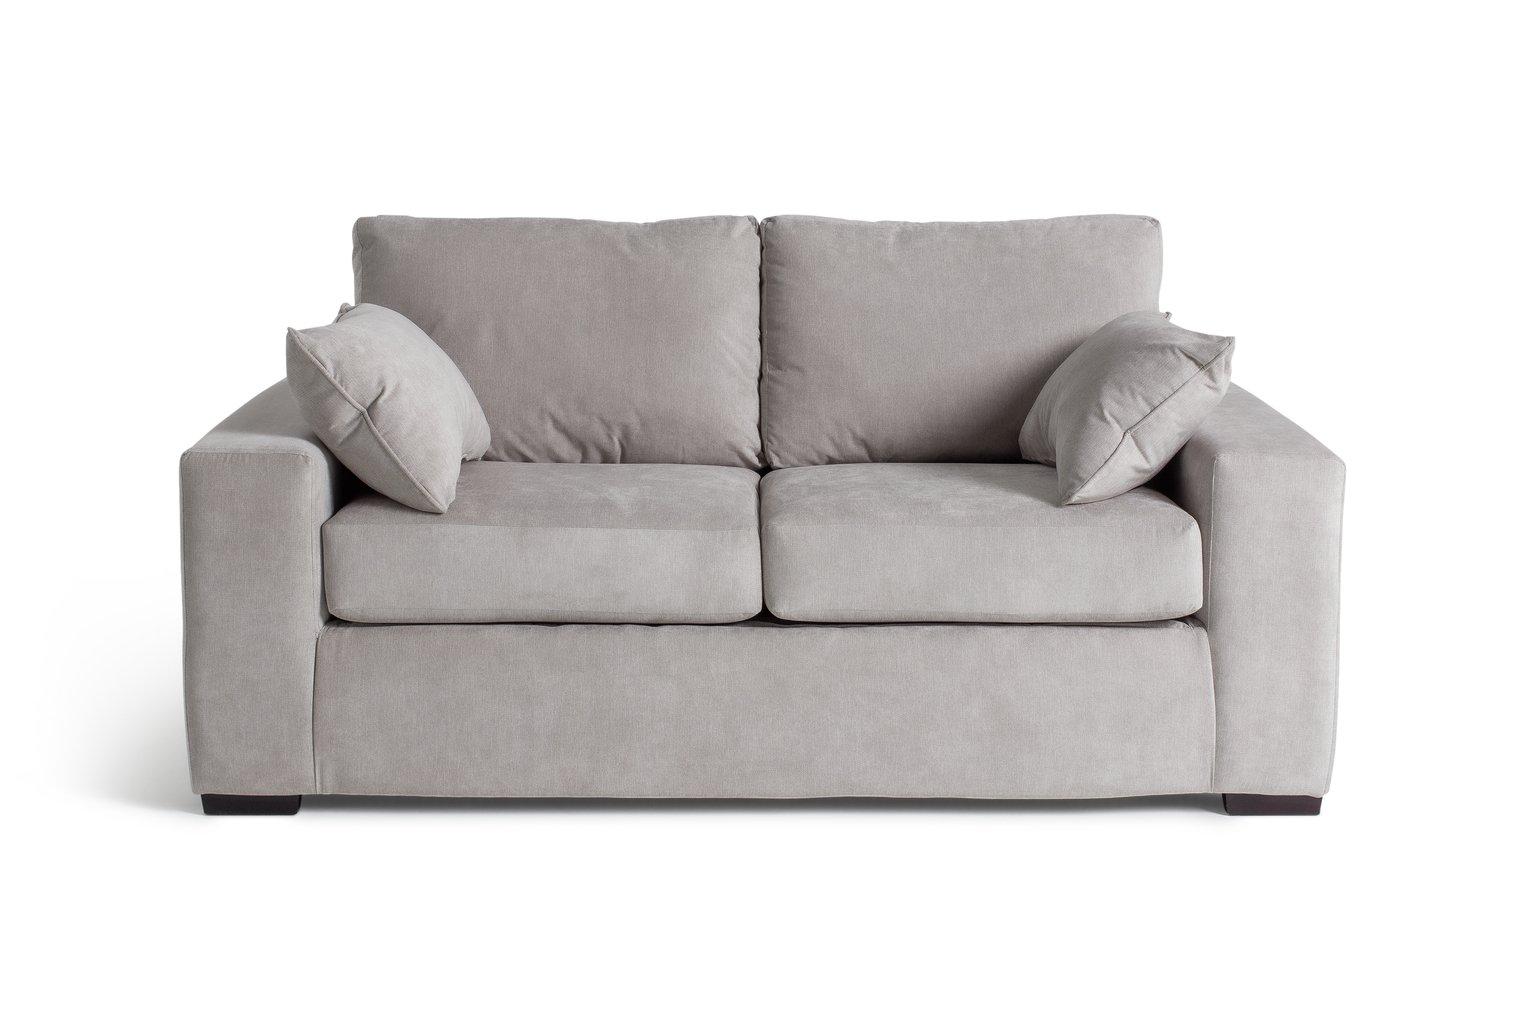 Argos Home Eton 2 Seater Fabric Sofa Bed - Grey